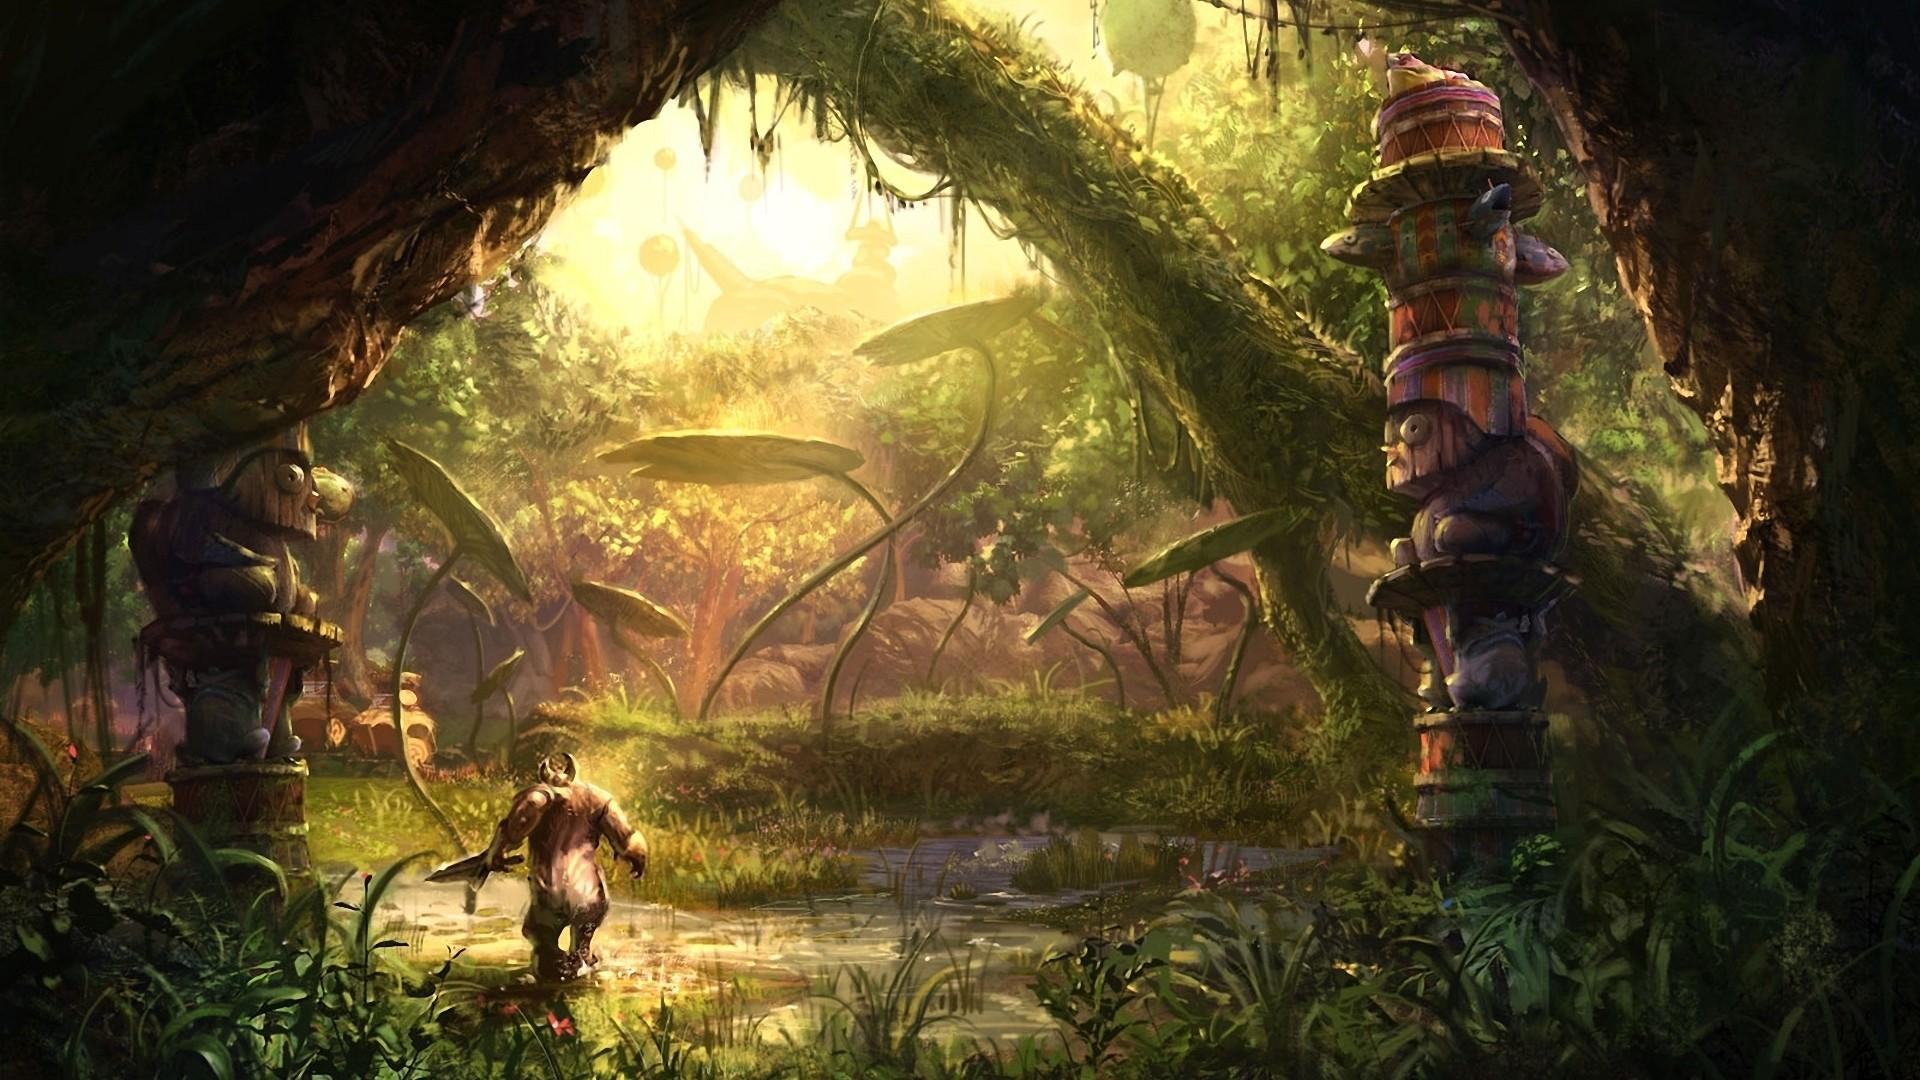 Download Fantasy Forest Wallpaper Hd Backgrounds Download